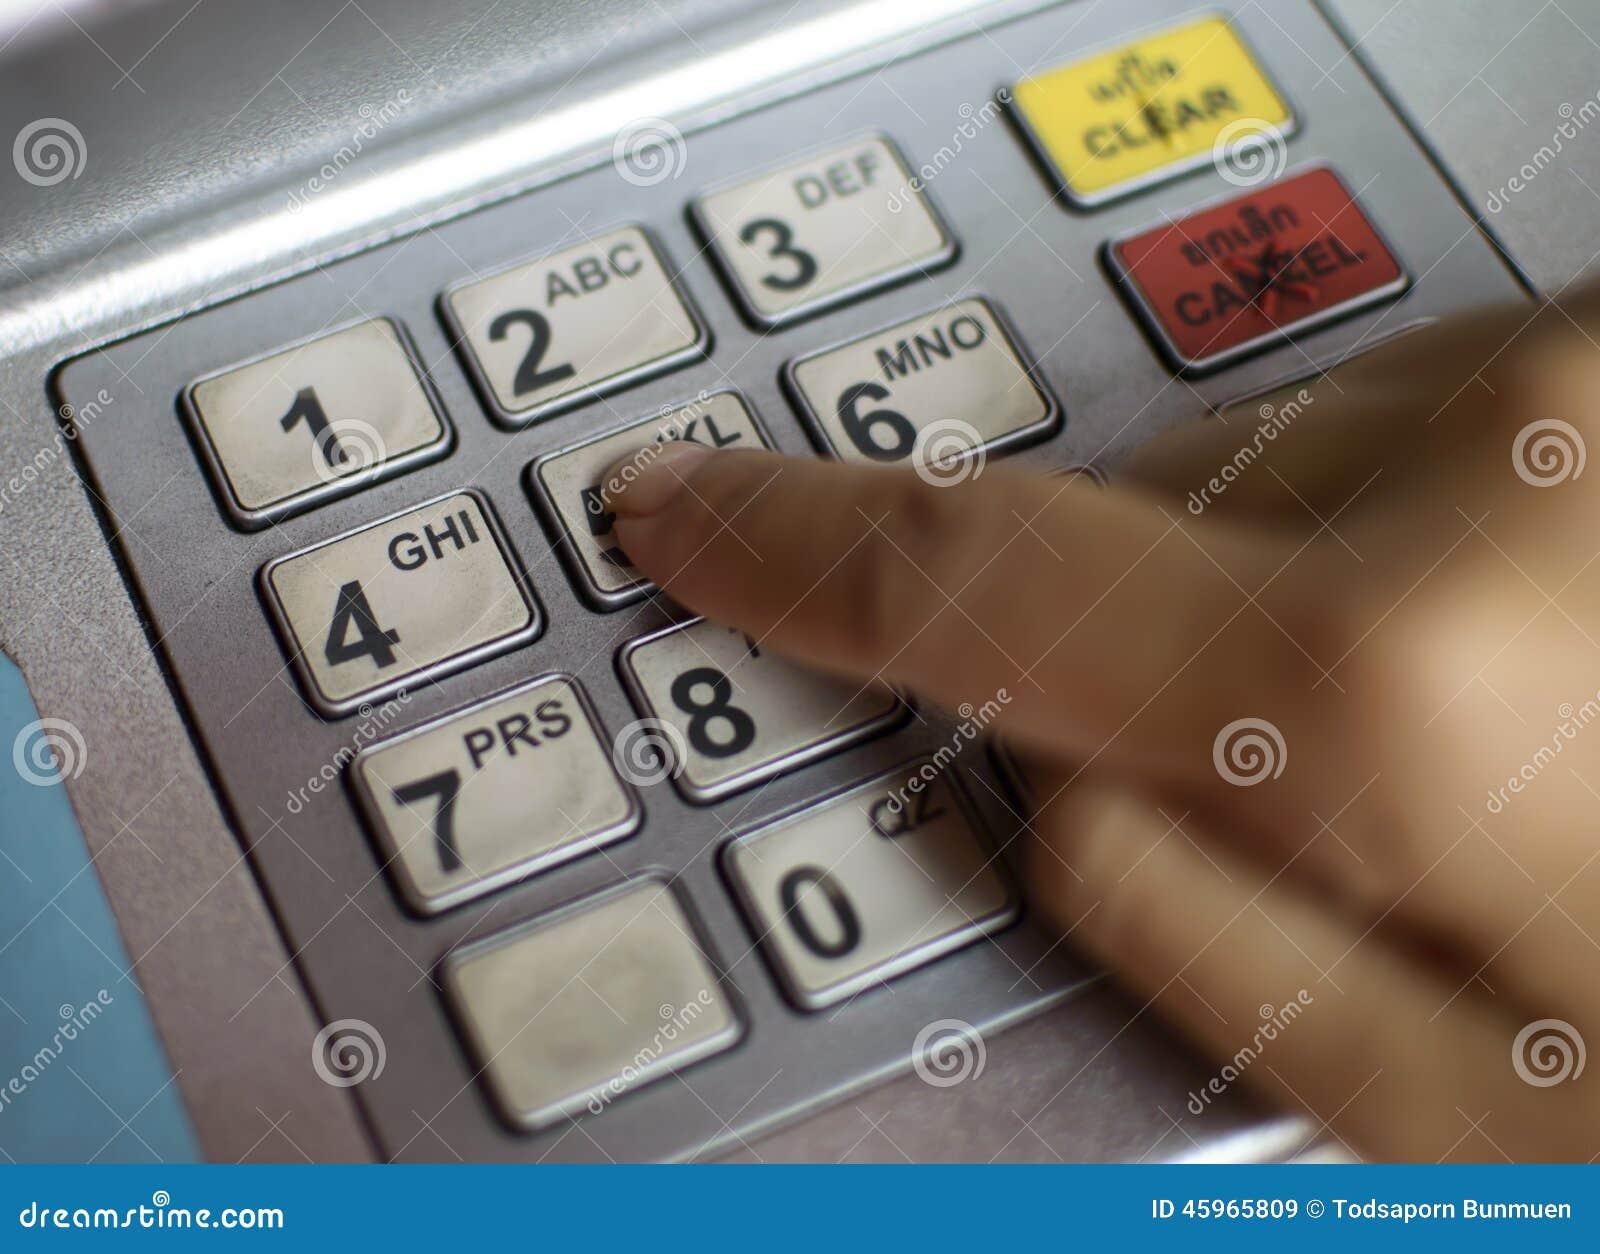 Close-up die van hand PIN/pass-code inzake ATM/bank-machinetoetsenbord ingaan